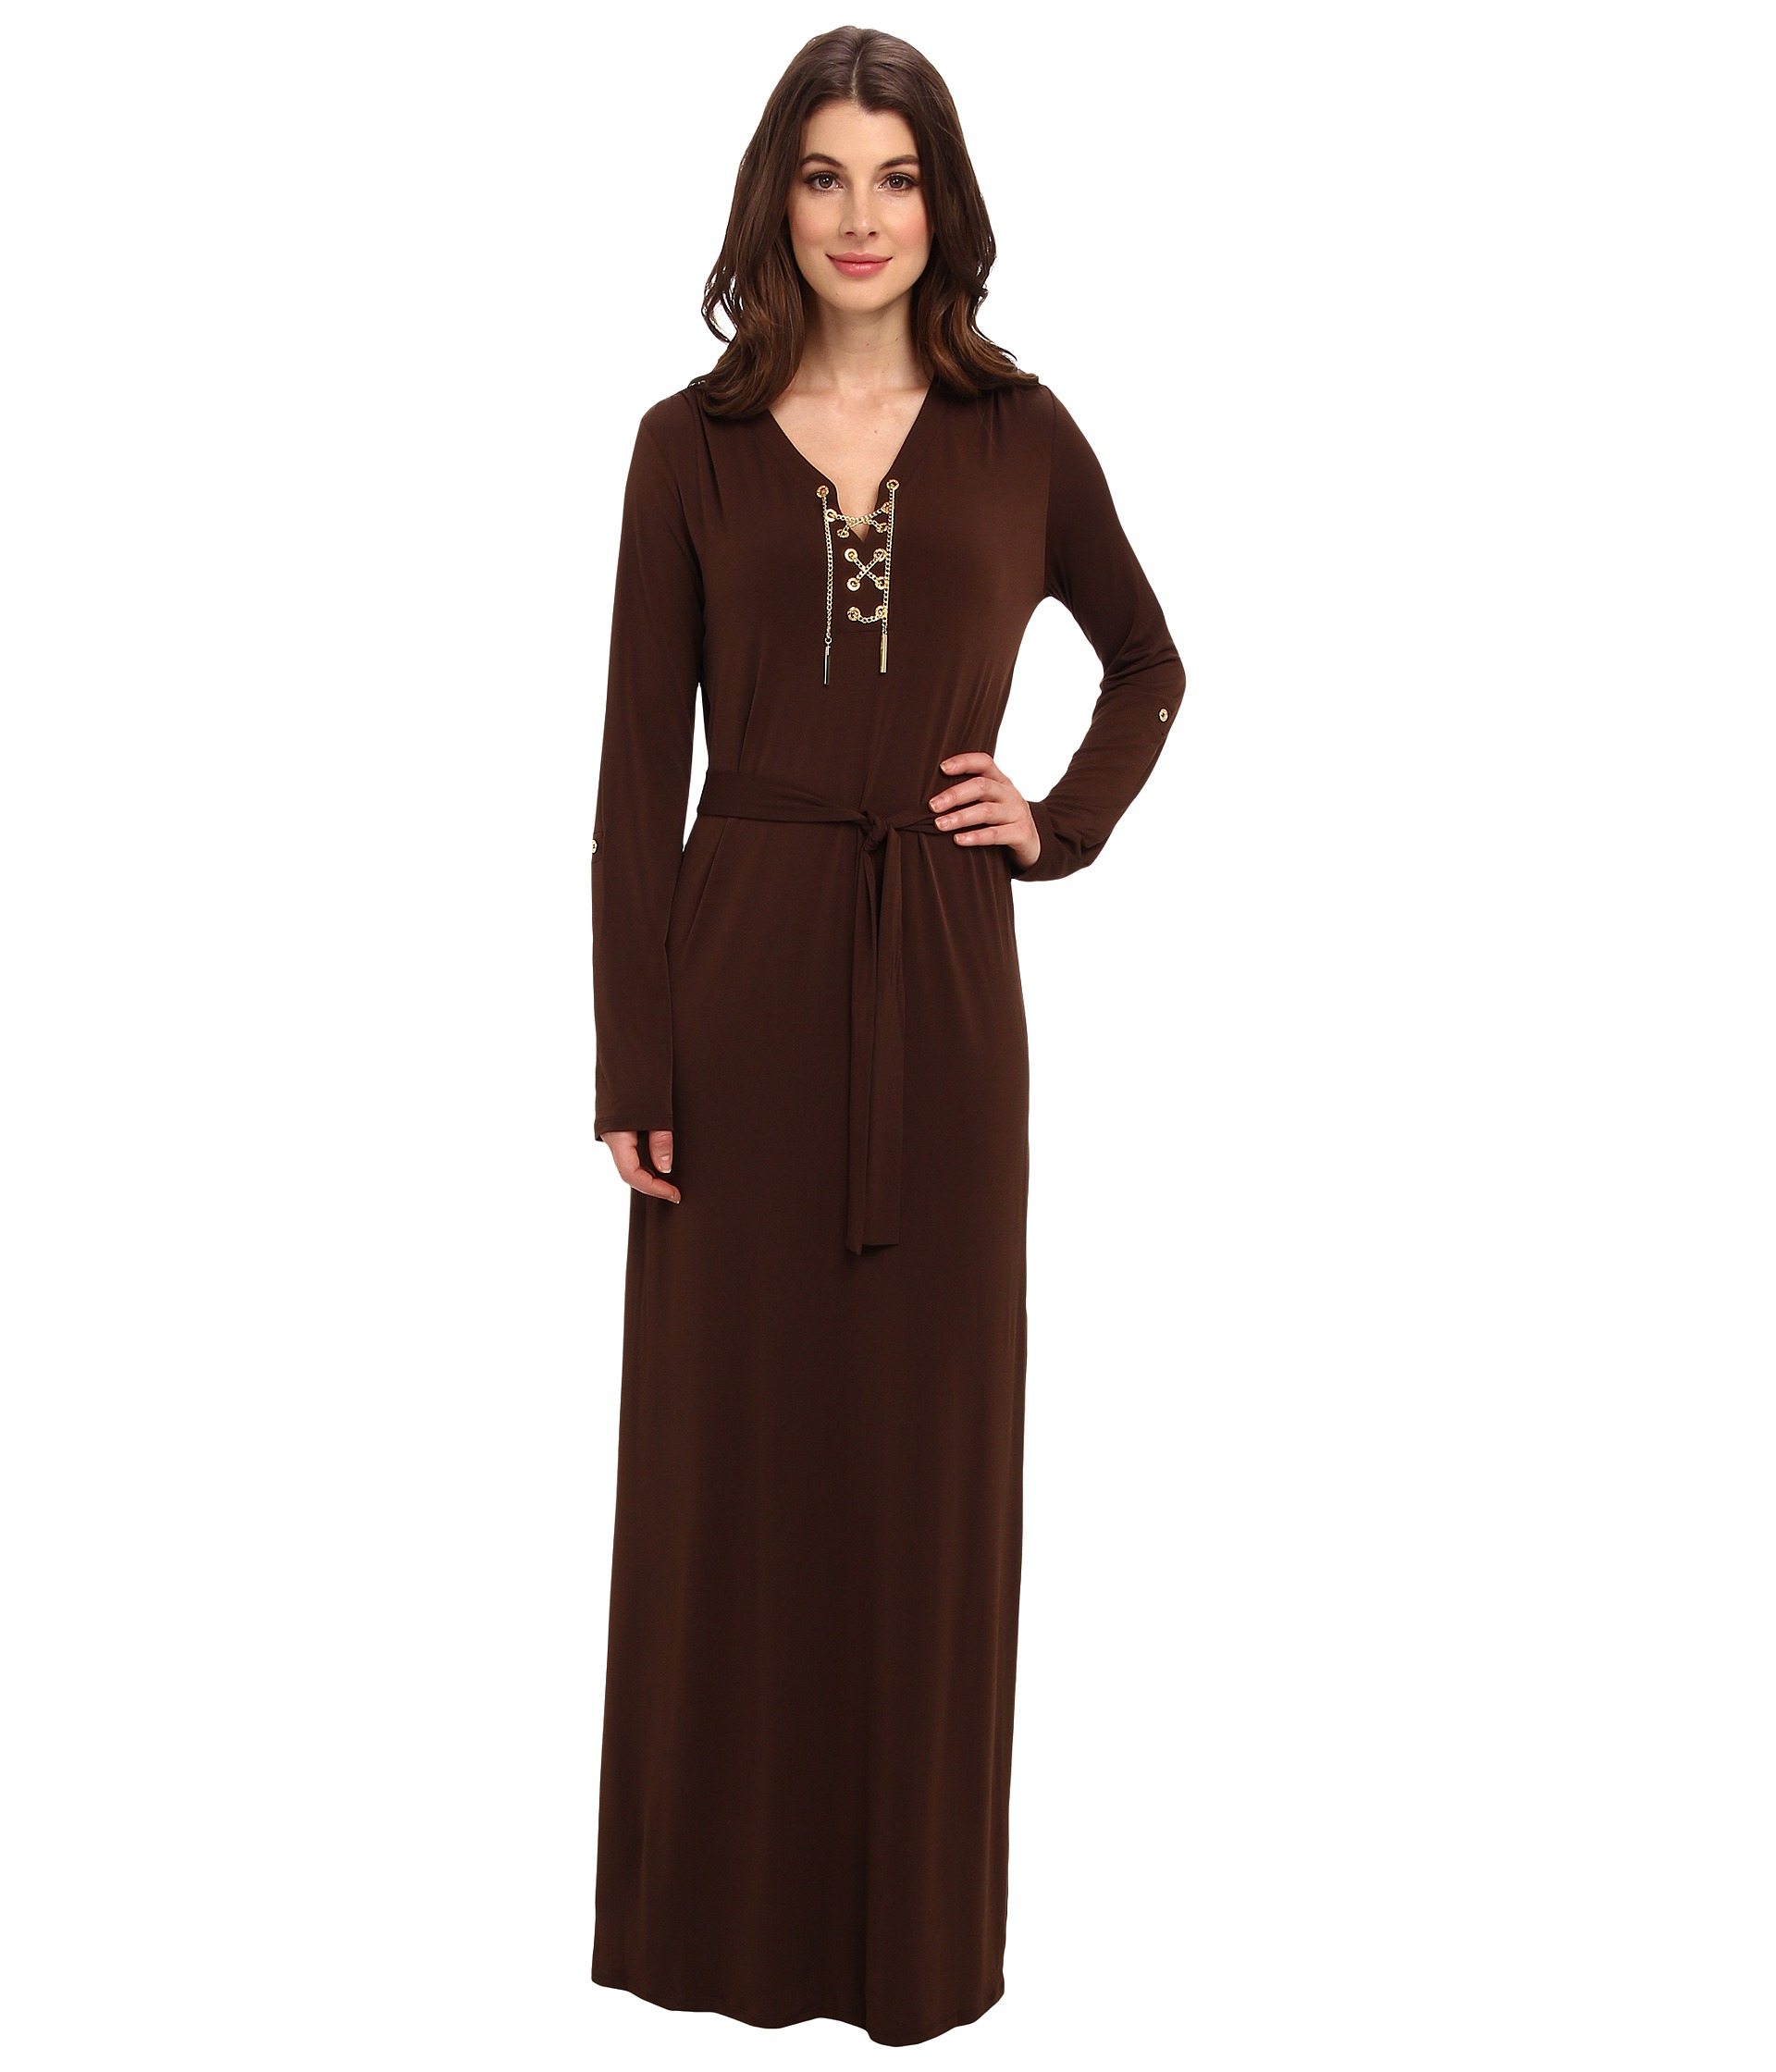 143617e55fa MICHAEL Michael Kors Maxi Chain Tie Dress in Brown - Lyst